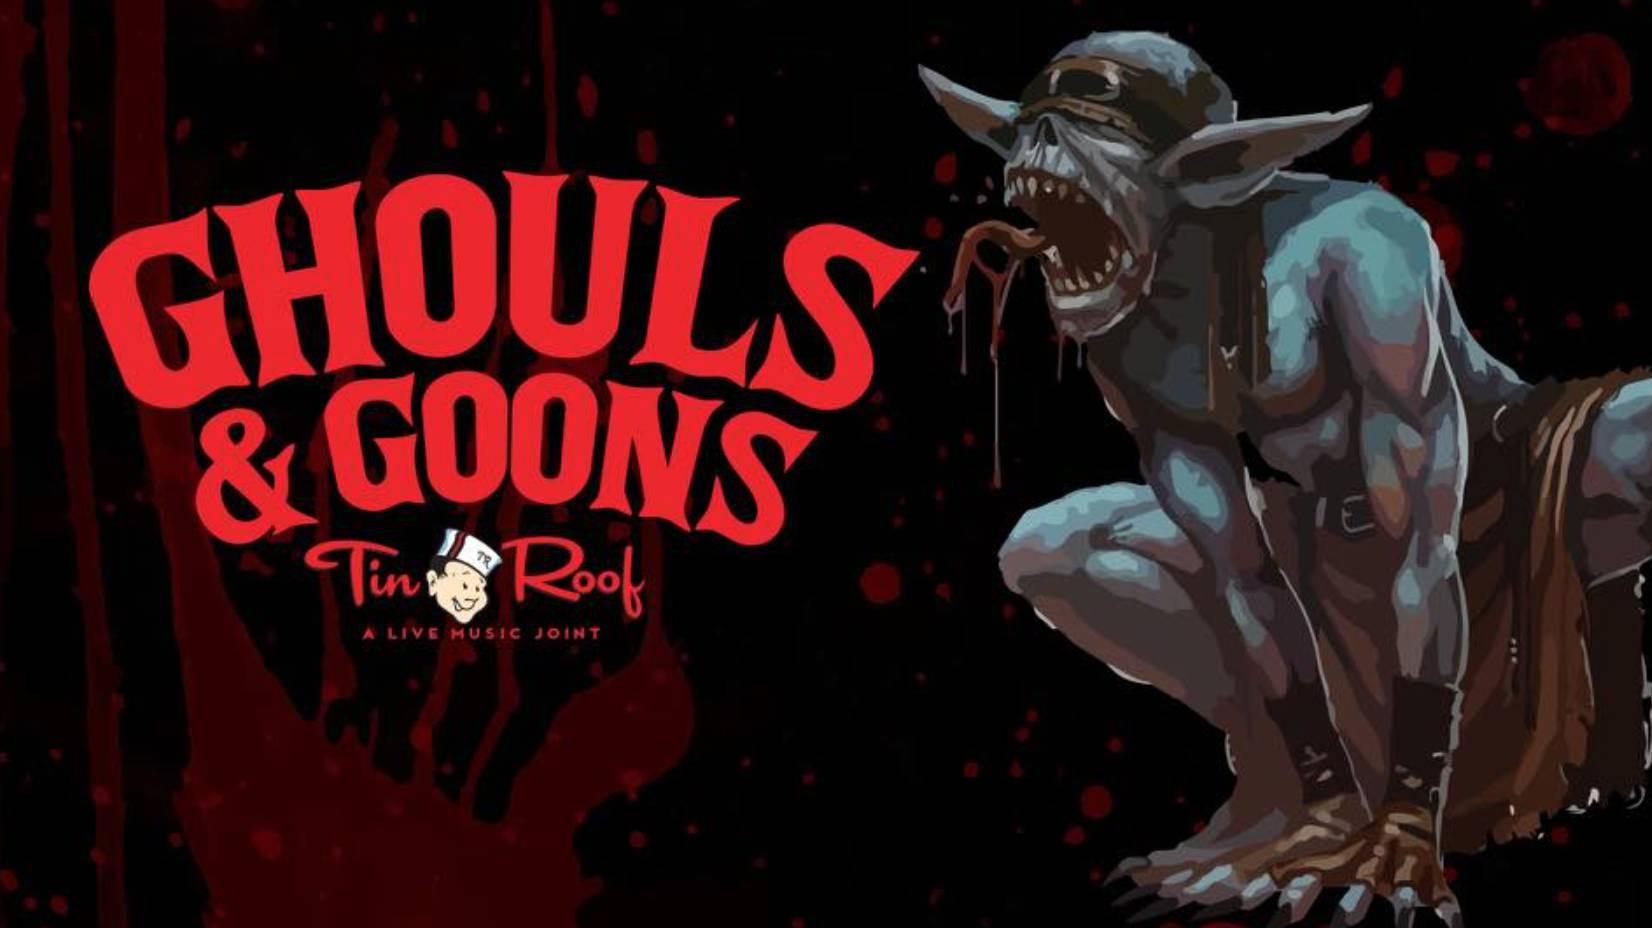 Ghouls & Goons & Killer Tunes